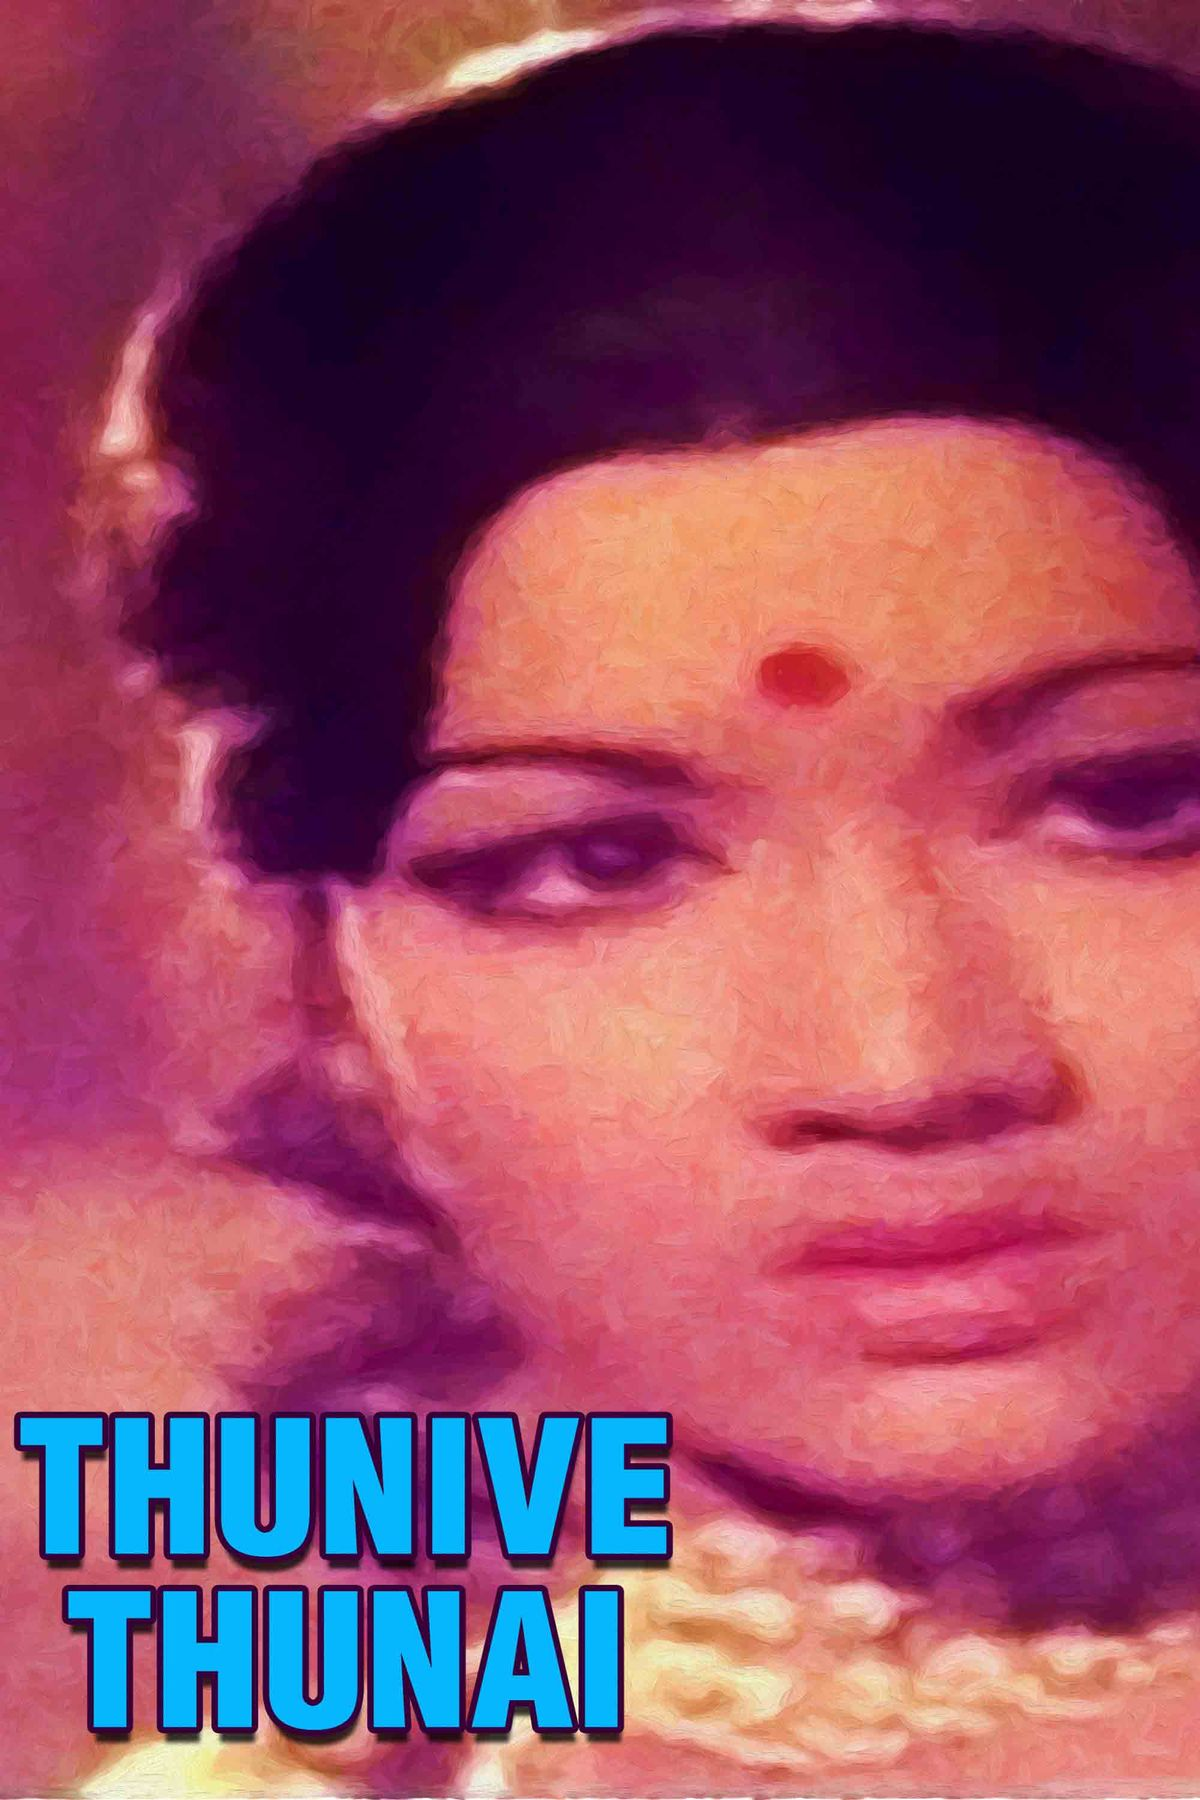 Thunive Thunai